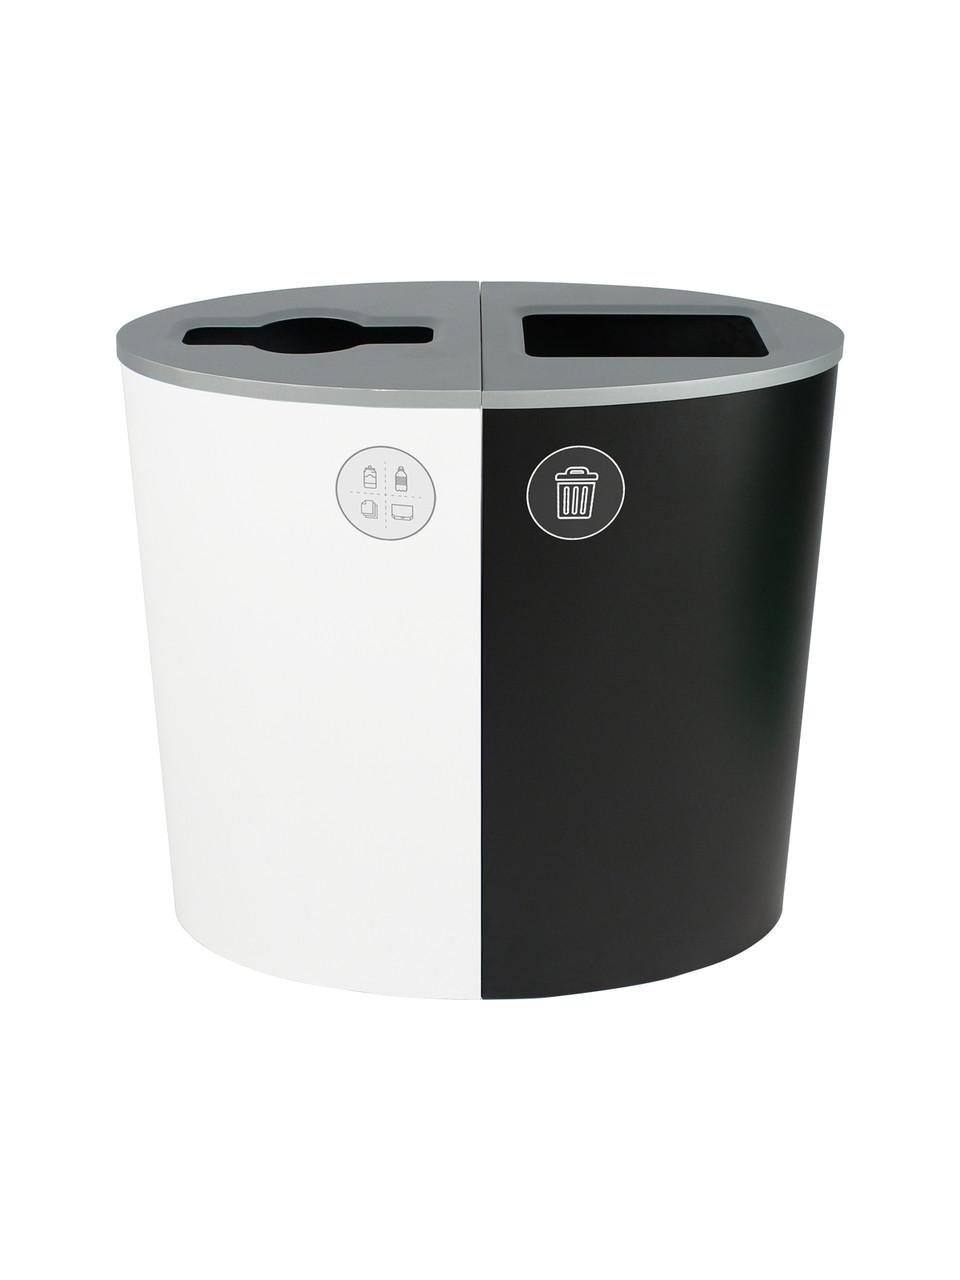 44 Gallon Spectrum Ellipse Dual Trash Can & Recycle Bin White/Black 8107078-24